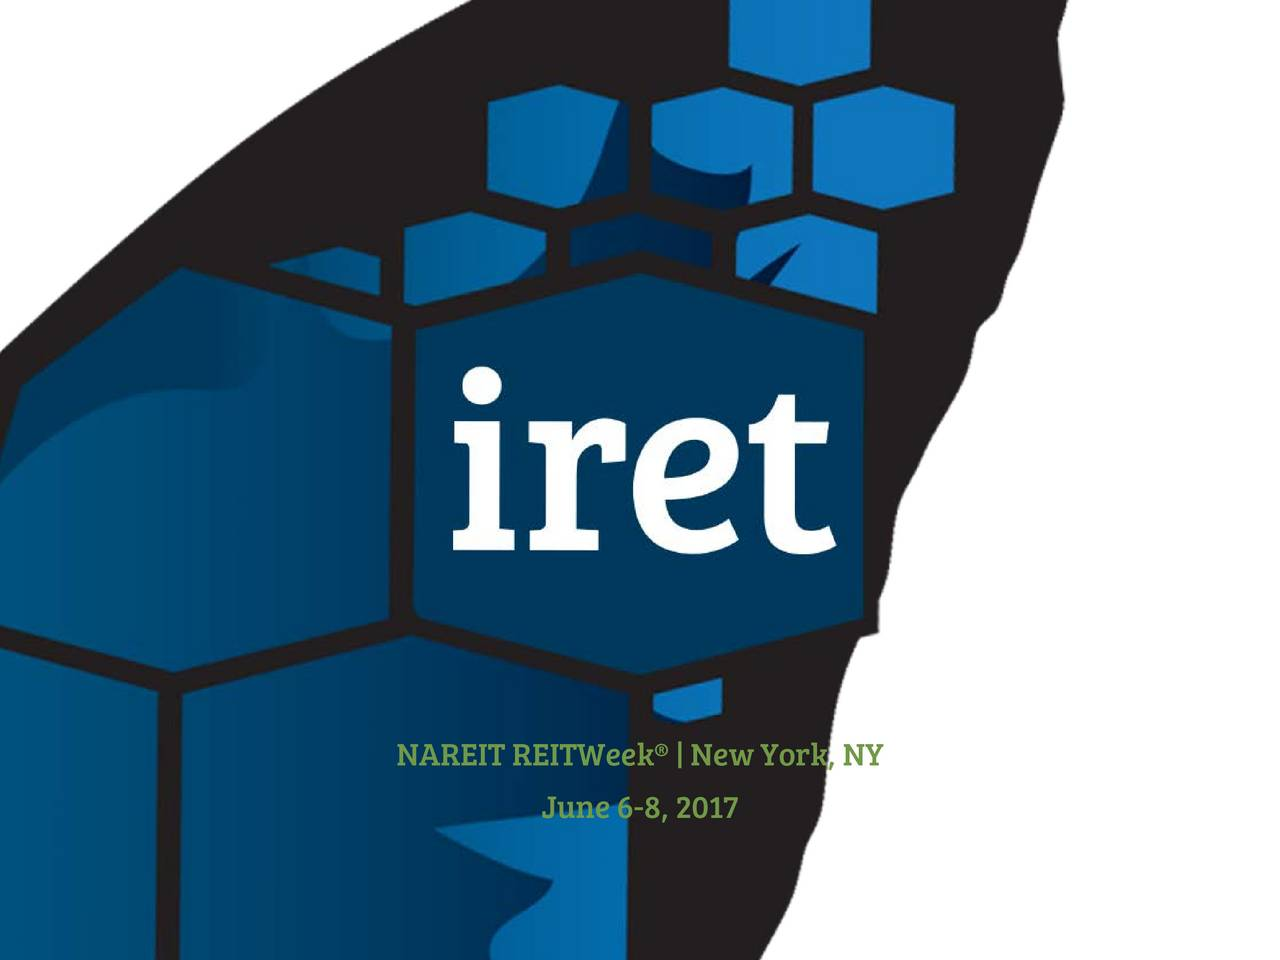 Investors Real Estate Trust (IRET) Presents At NAREIT's